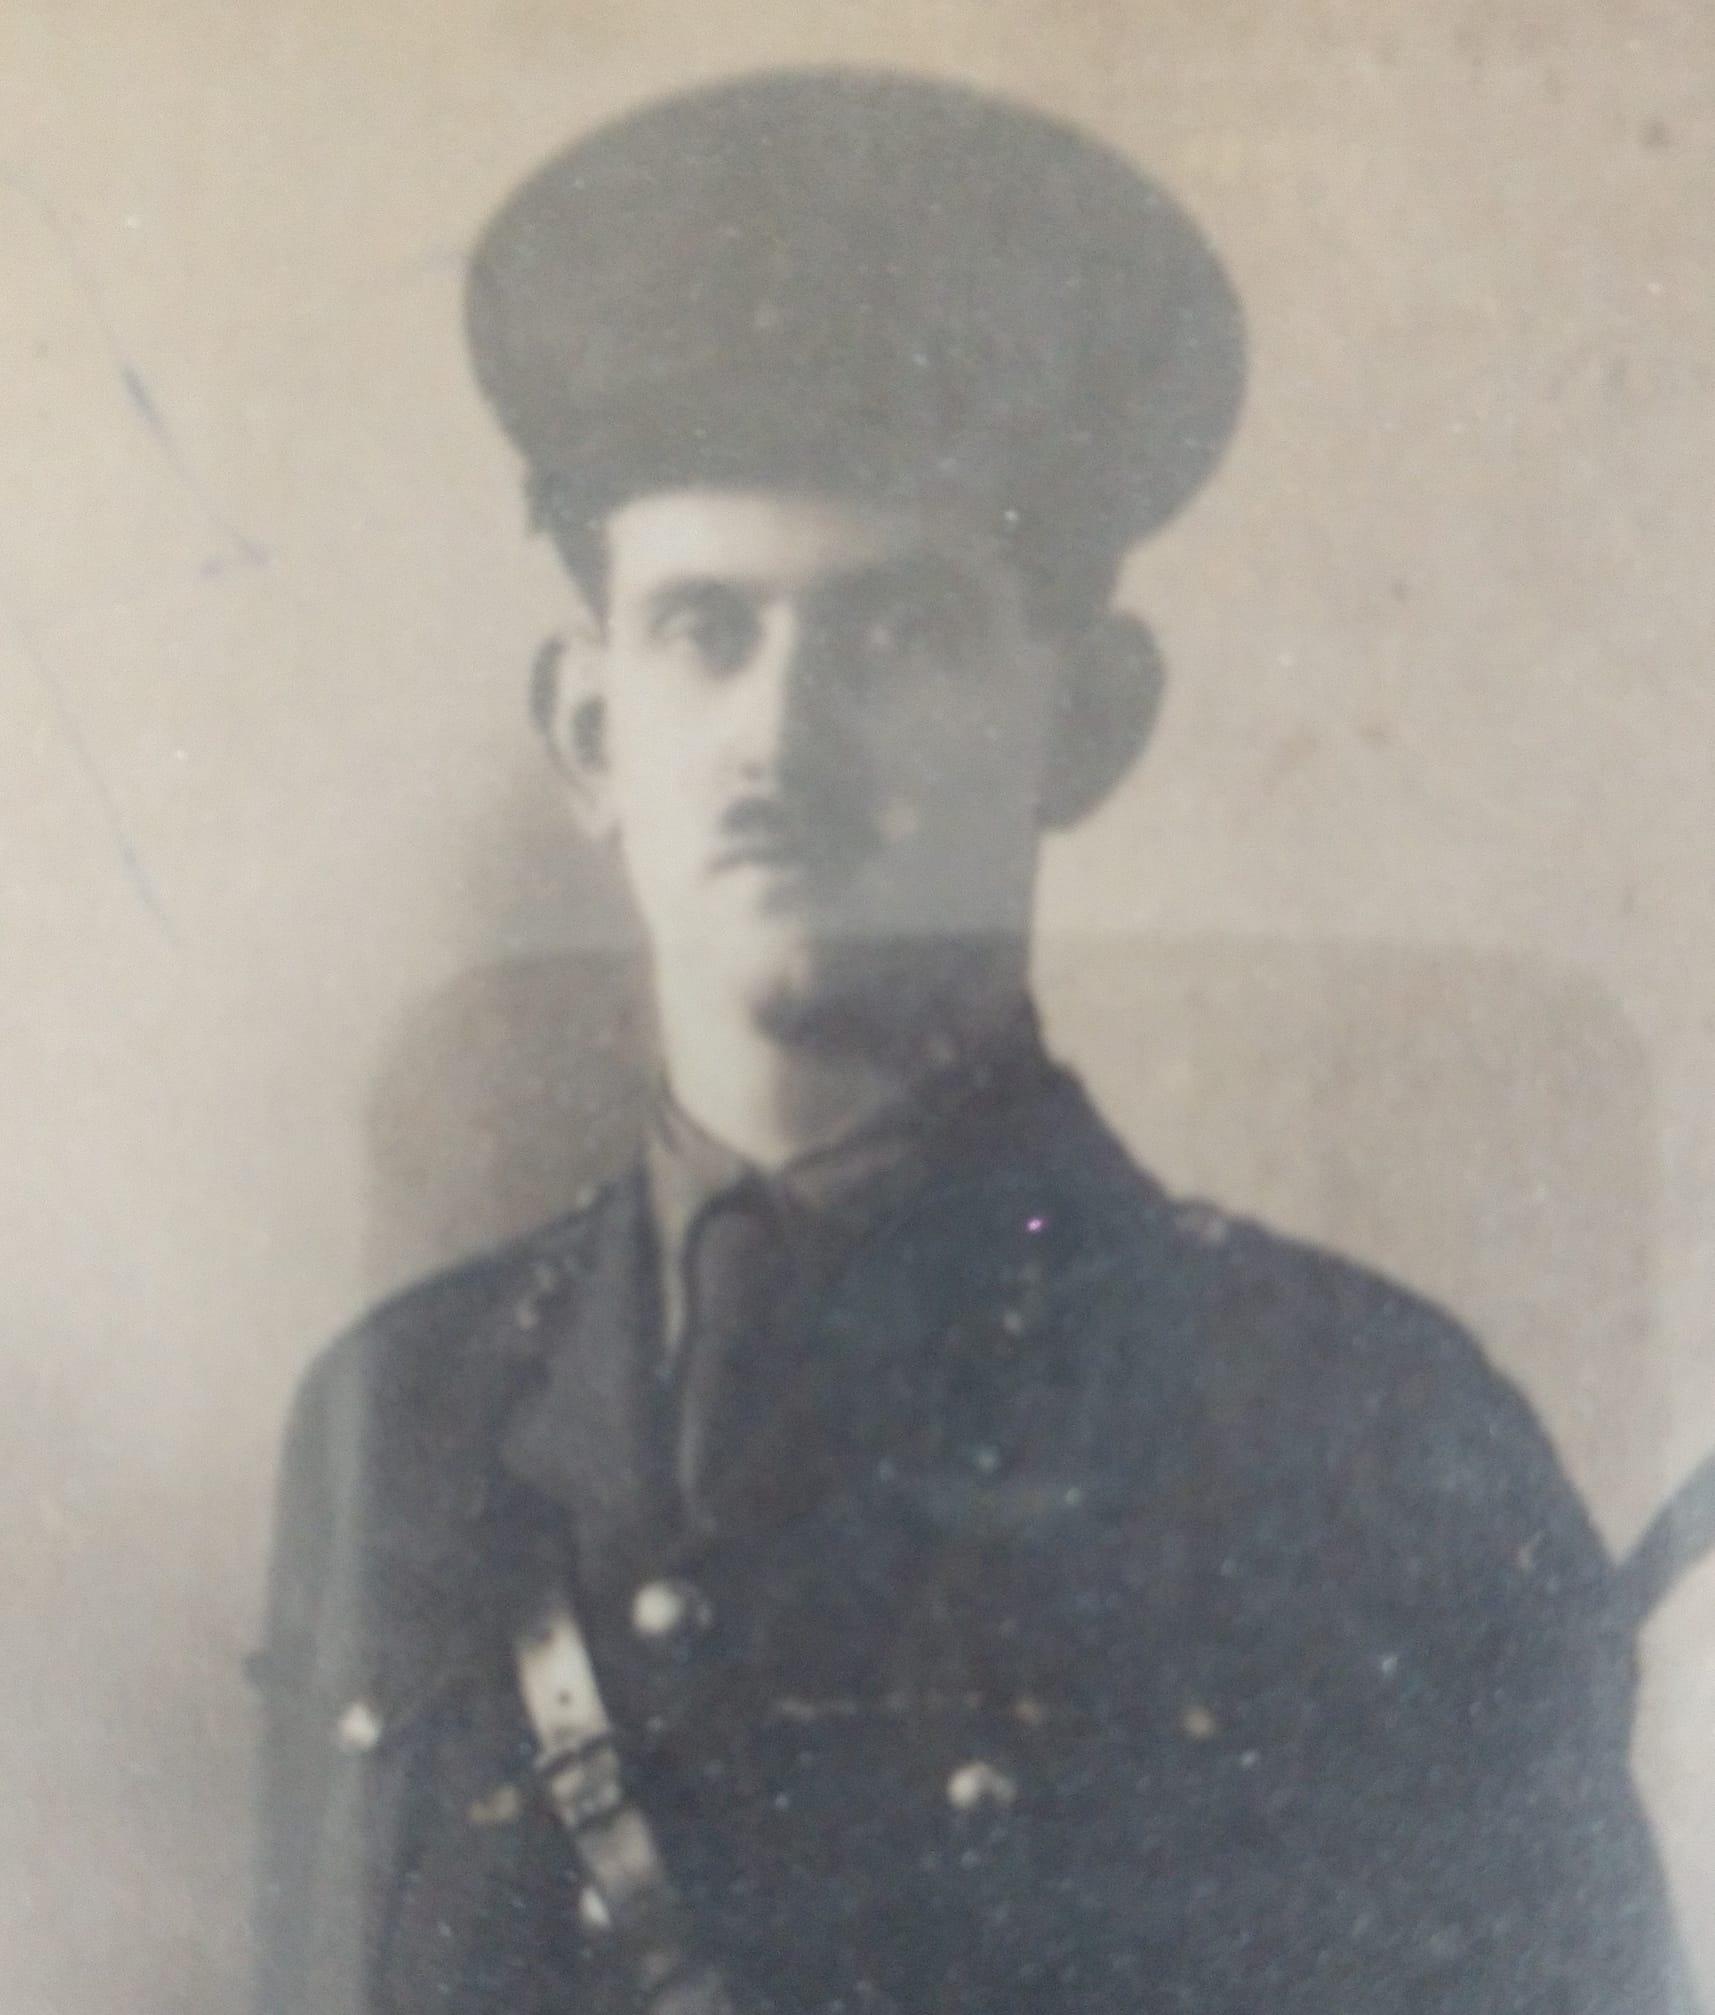 Sean MacCabe - Remembering Forgotten Veterans of World War I